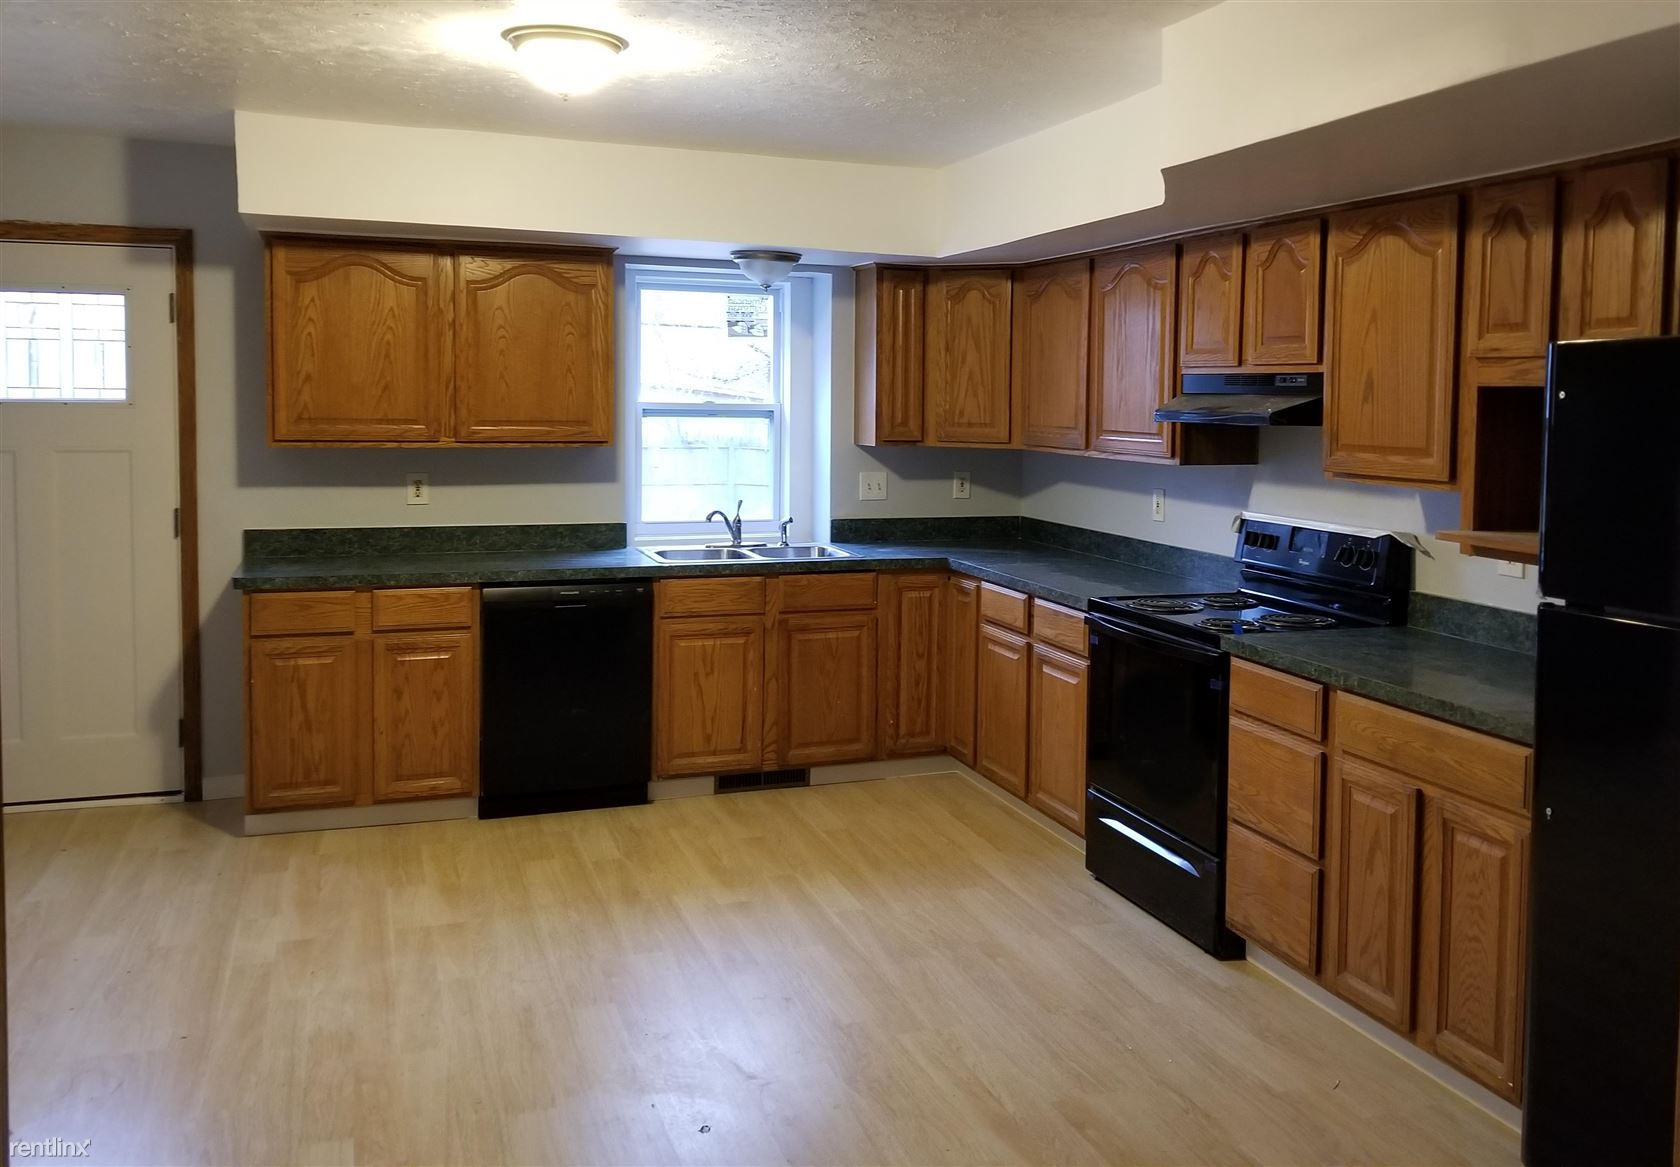 866 Madison St, Ypsilanti, MI - $1,900